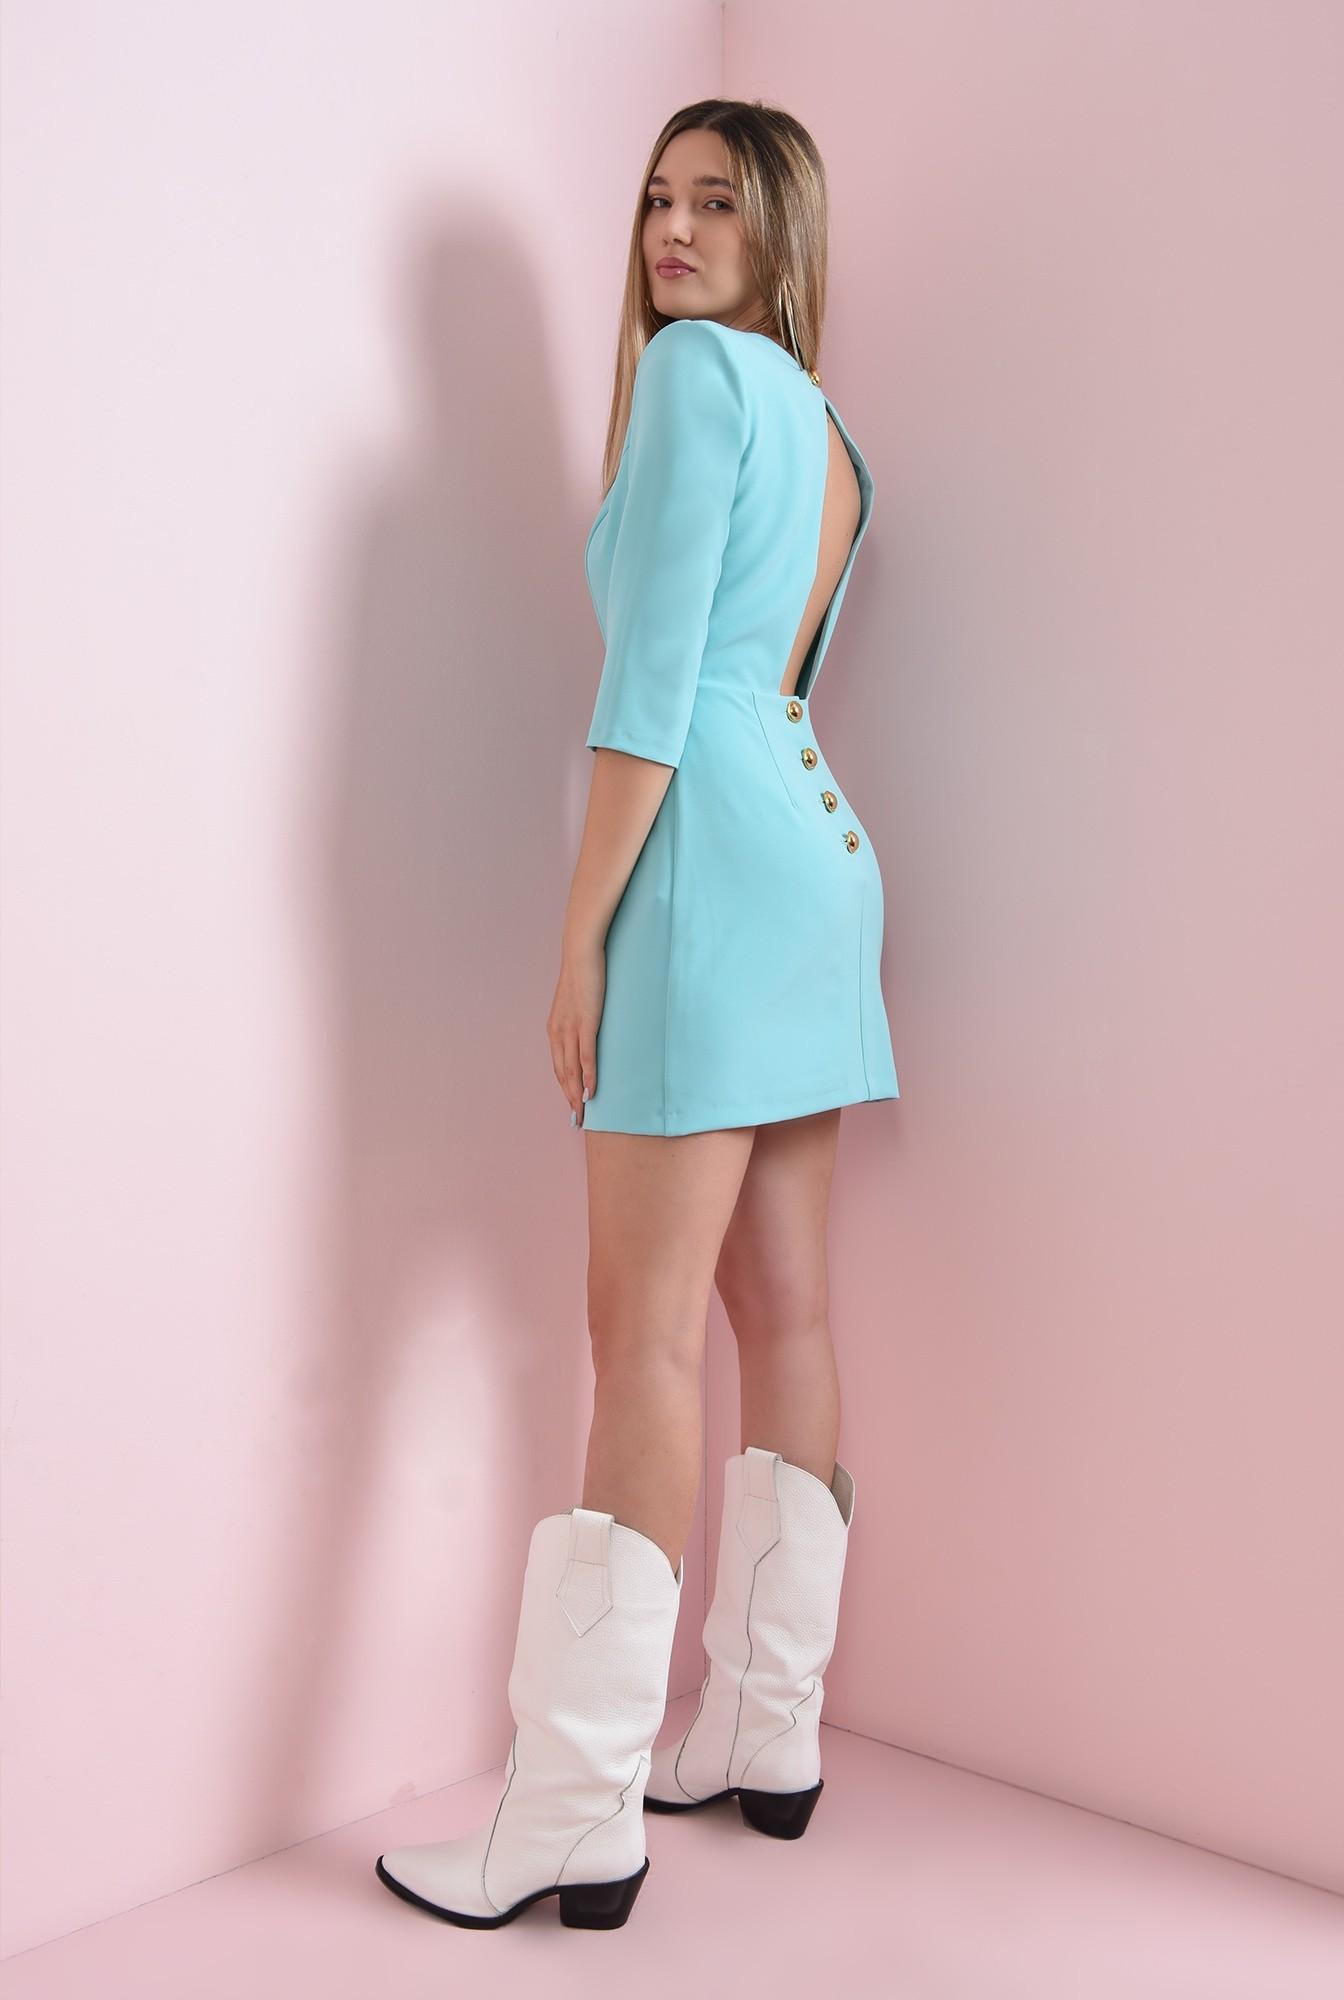 0 - rochie mini, turcoaz, cu nasturi aurii